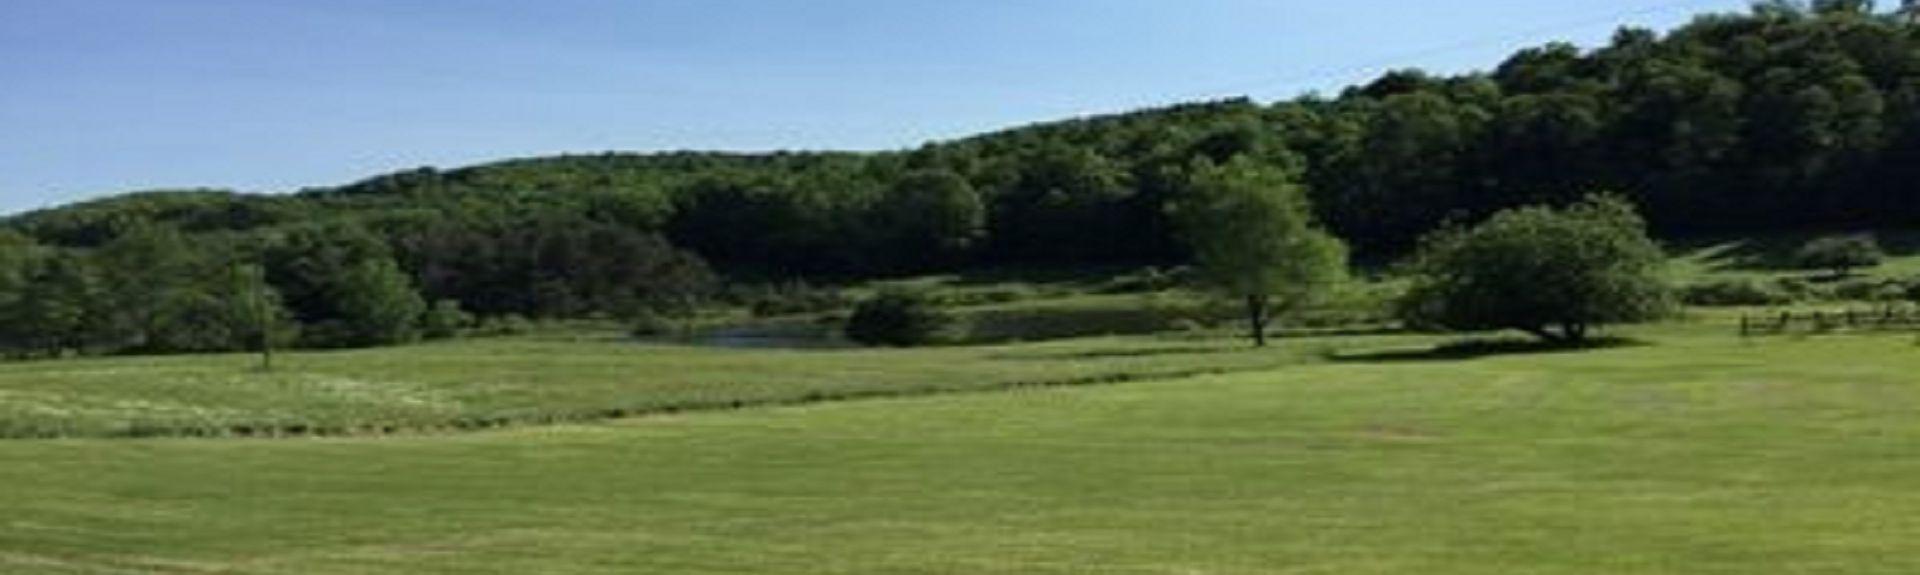 Meadow Links Golf Course, Richfield Springs, Nova York, Estados Unidos